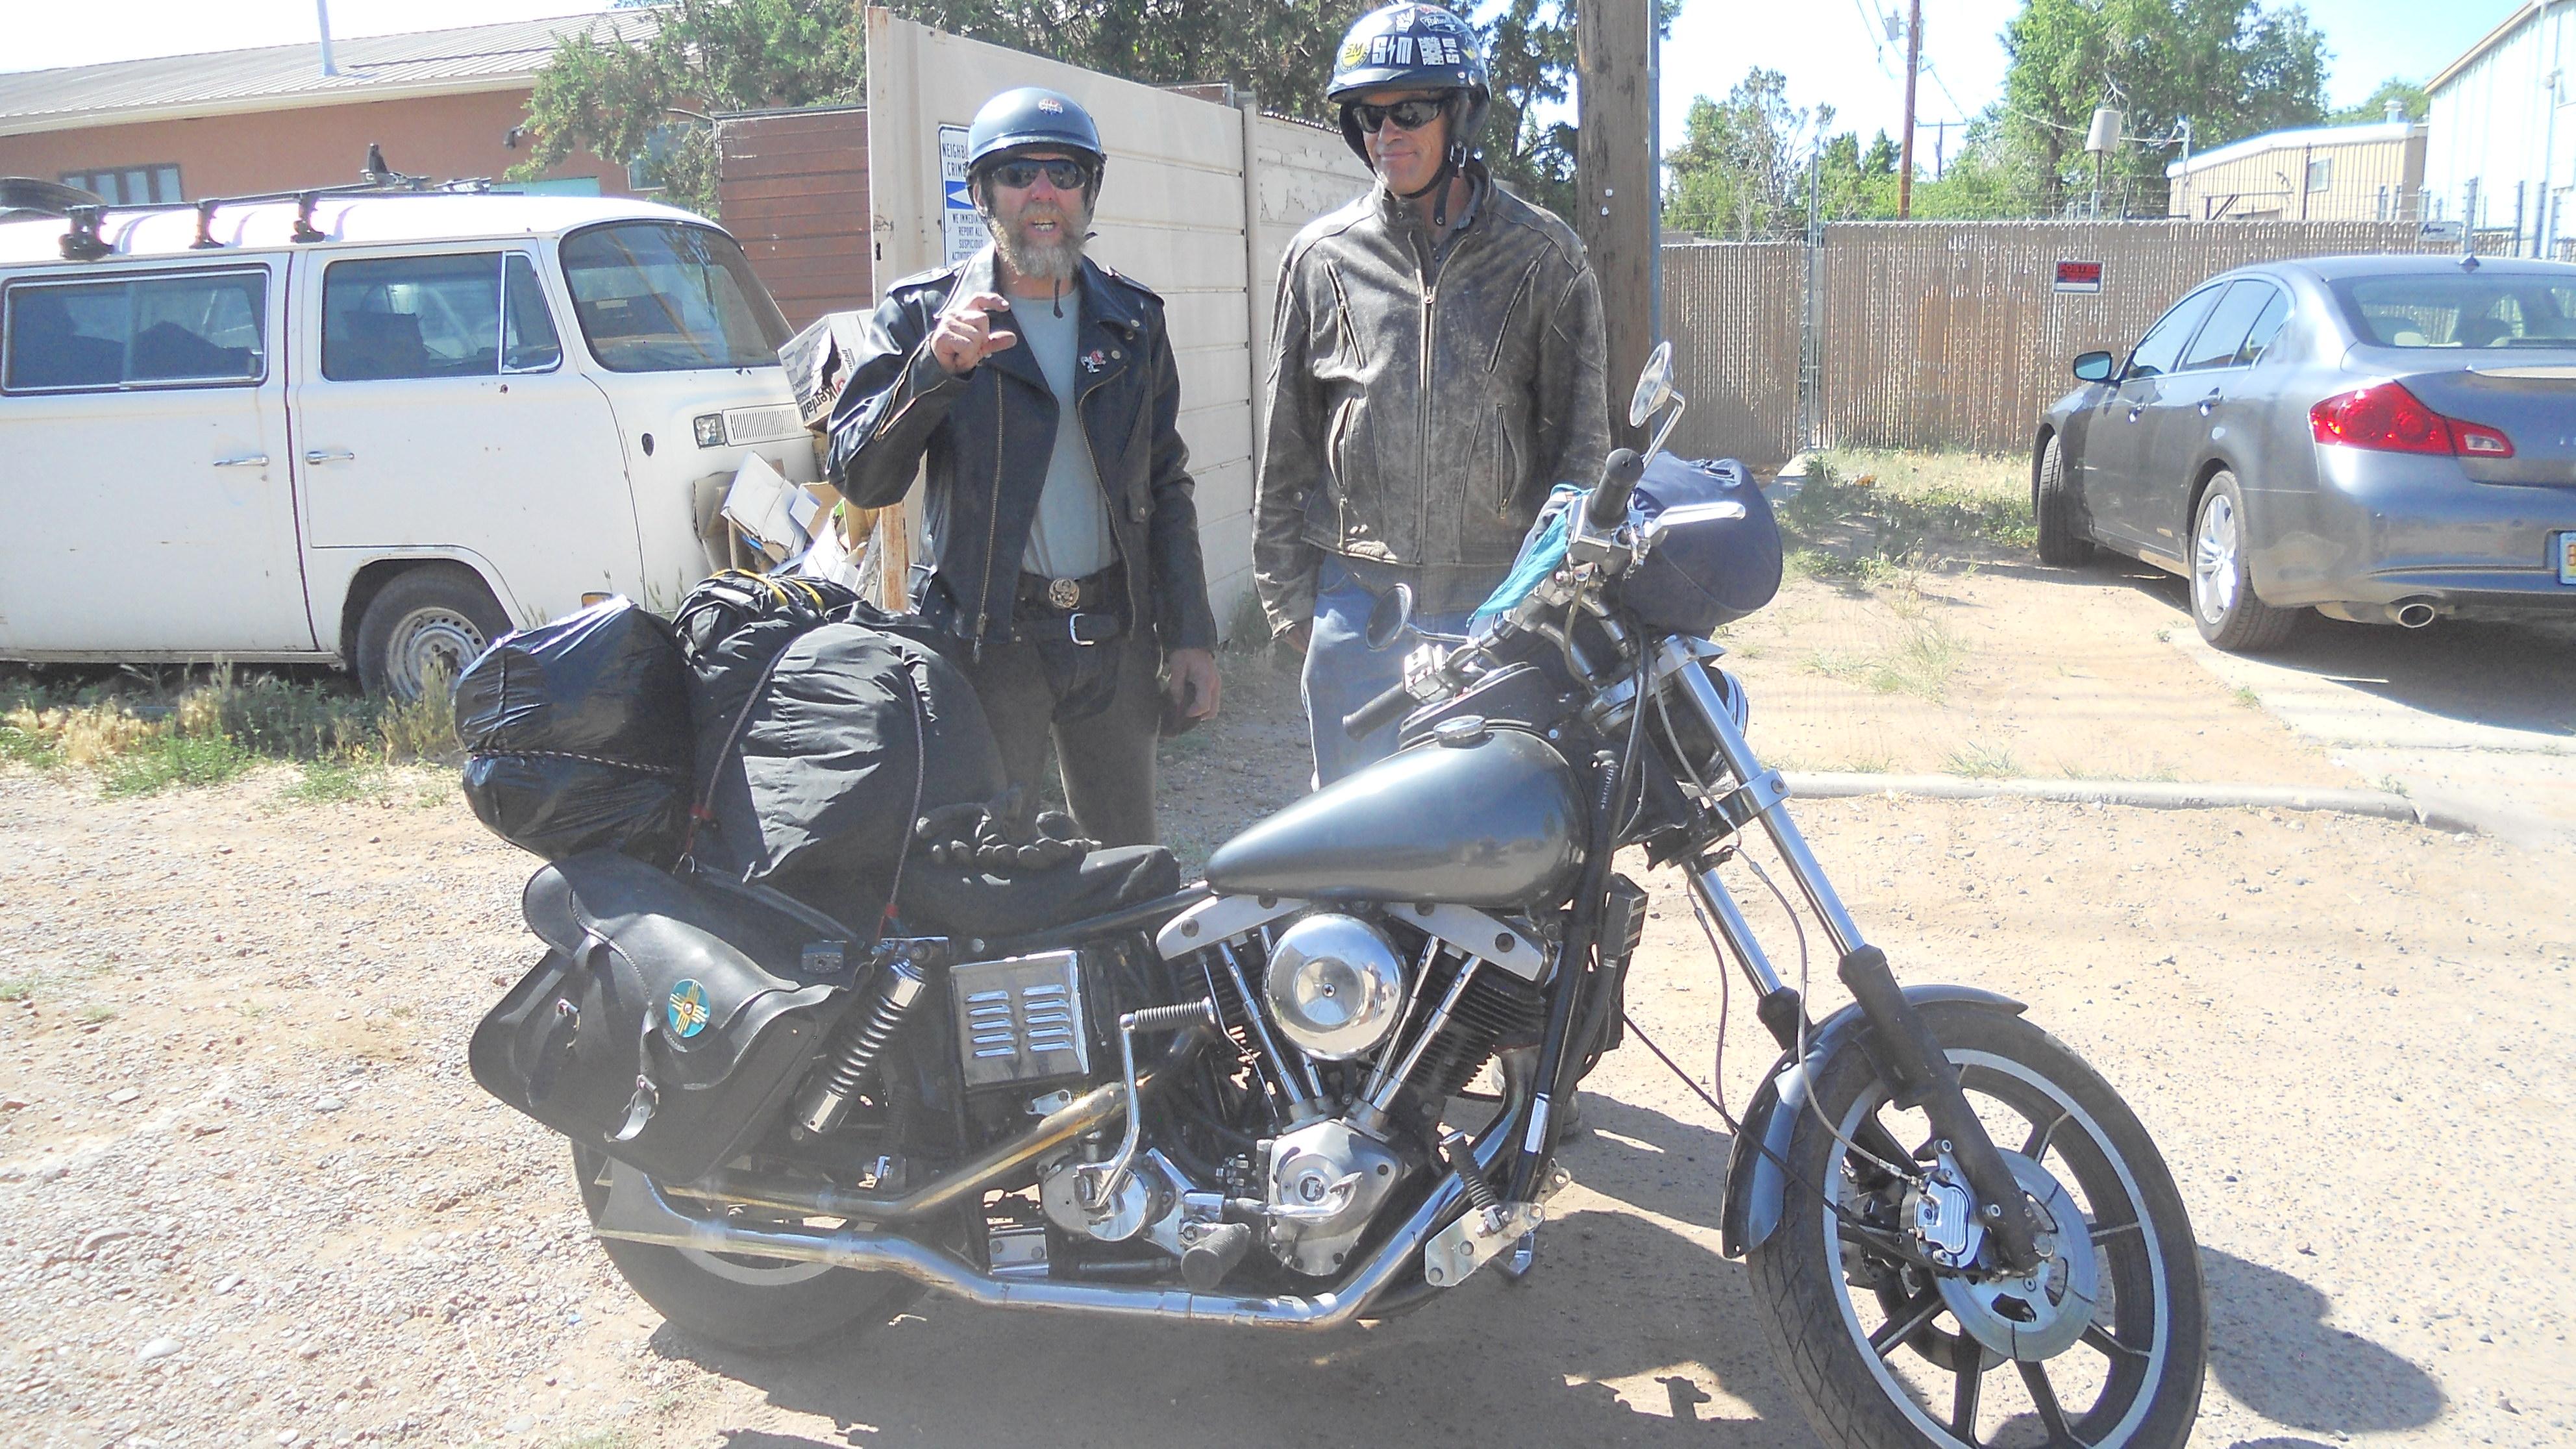 6-29-15Ouray cycle trip W Jim 002.JPG